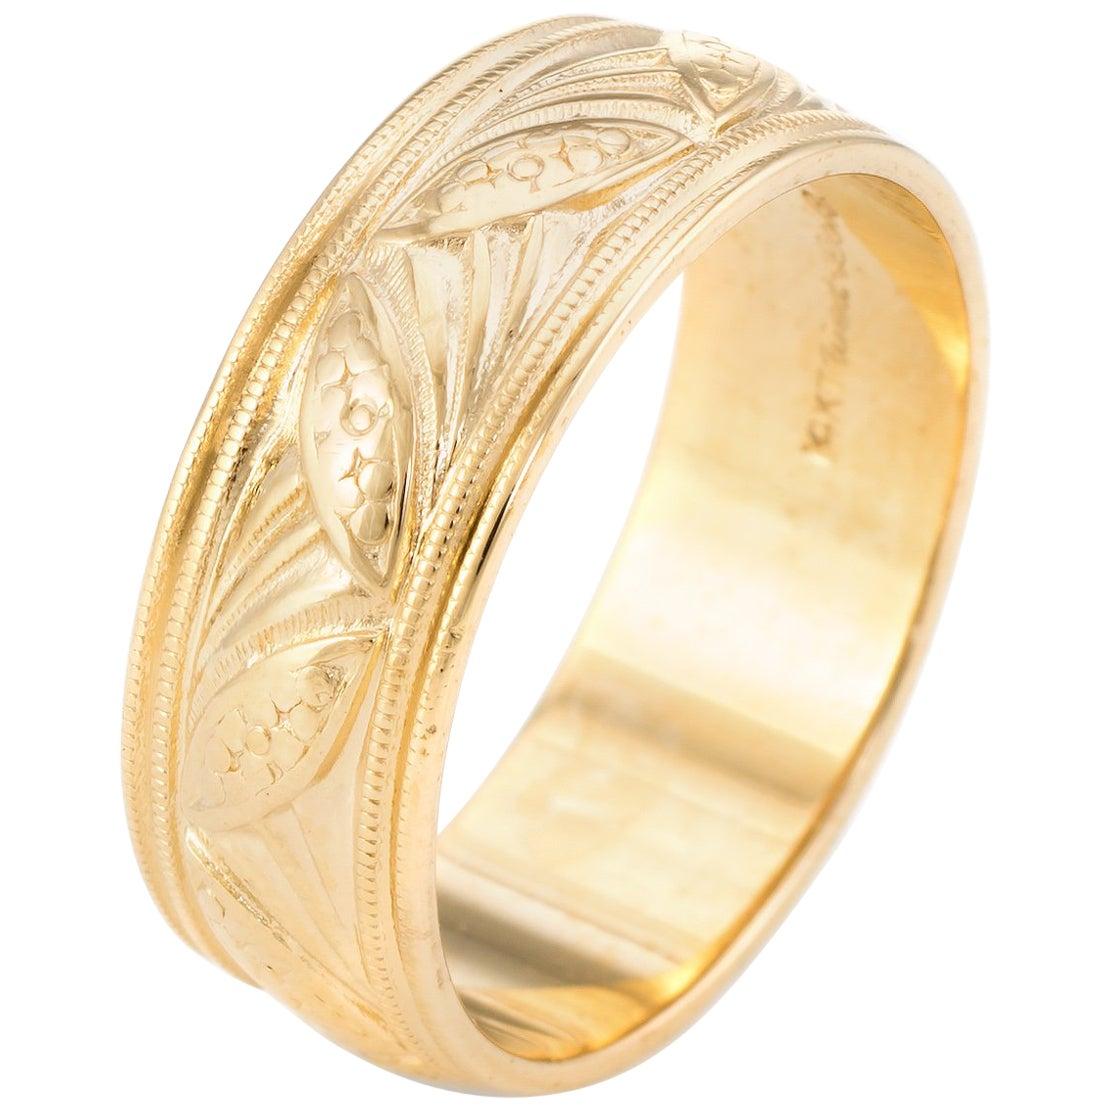 Wedding Band Ring Vintage 14 Karat Yellow Gold Estate Fine Bridal Jewelry